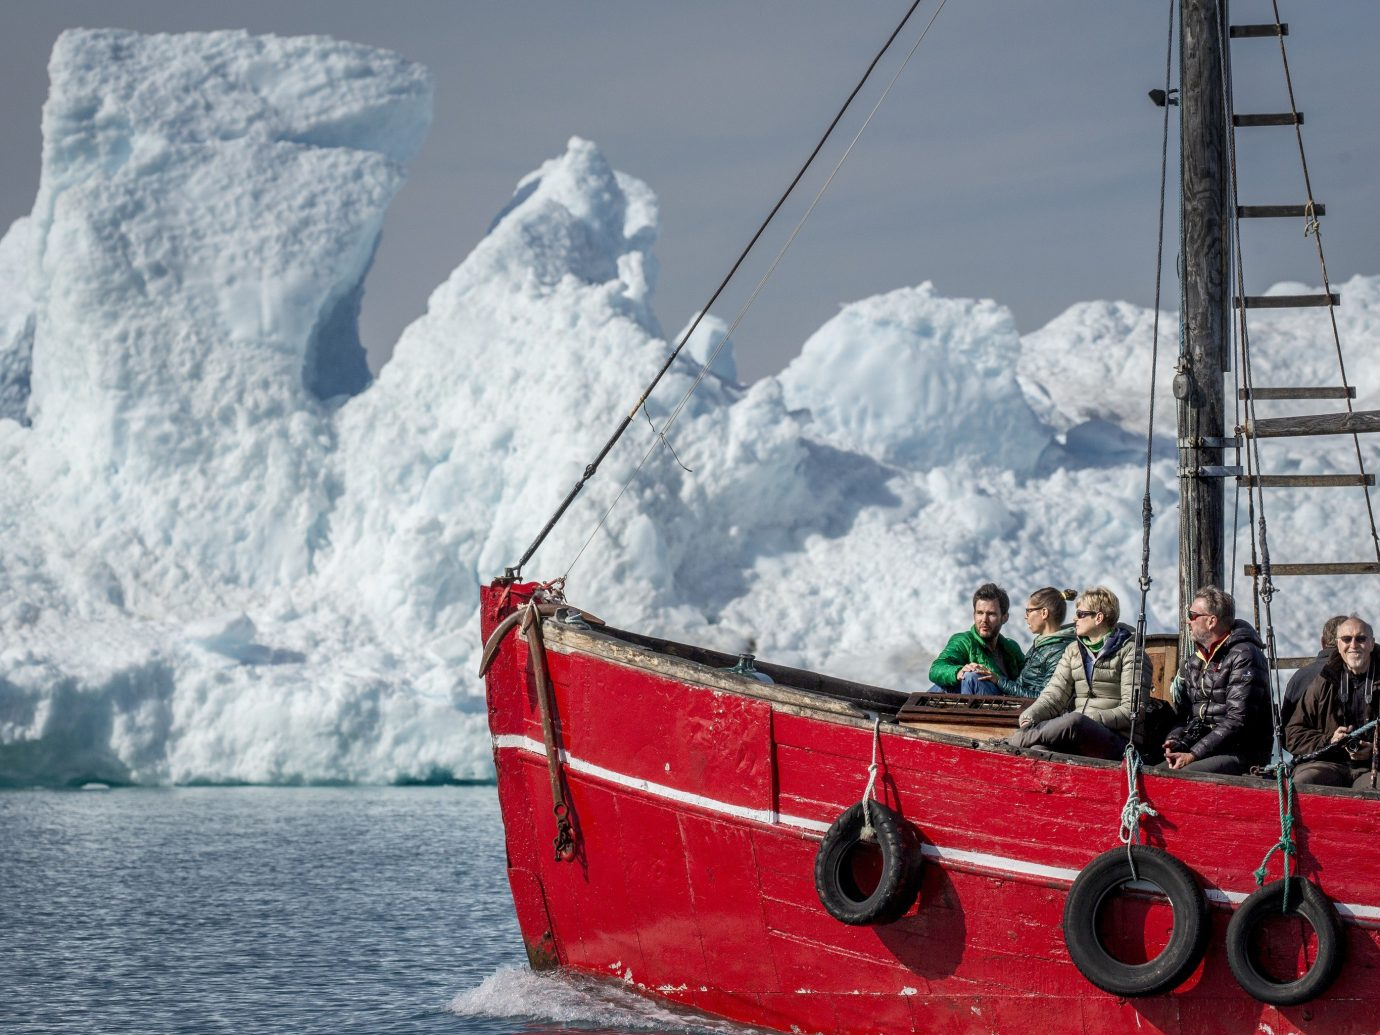 An iceboat near the Qooroq ice fjord in Narsarsuaq